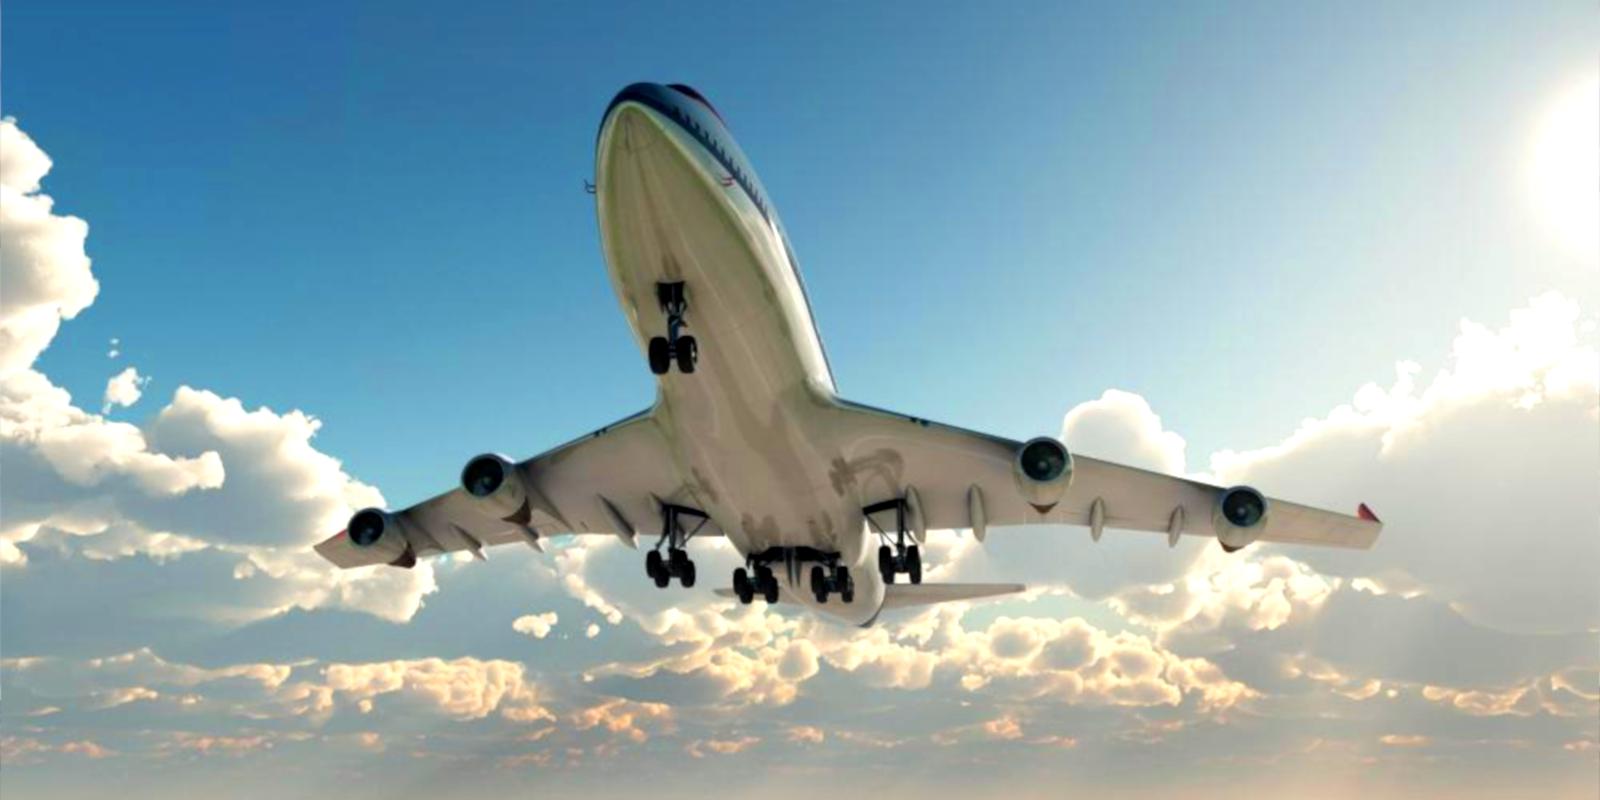 Plane03